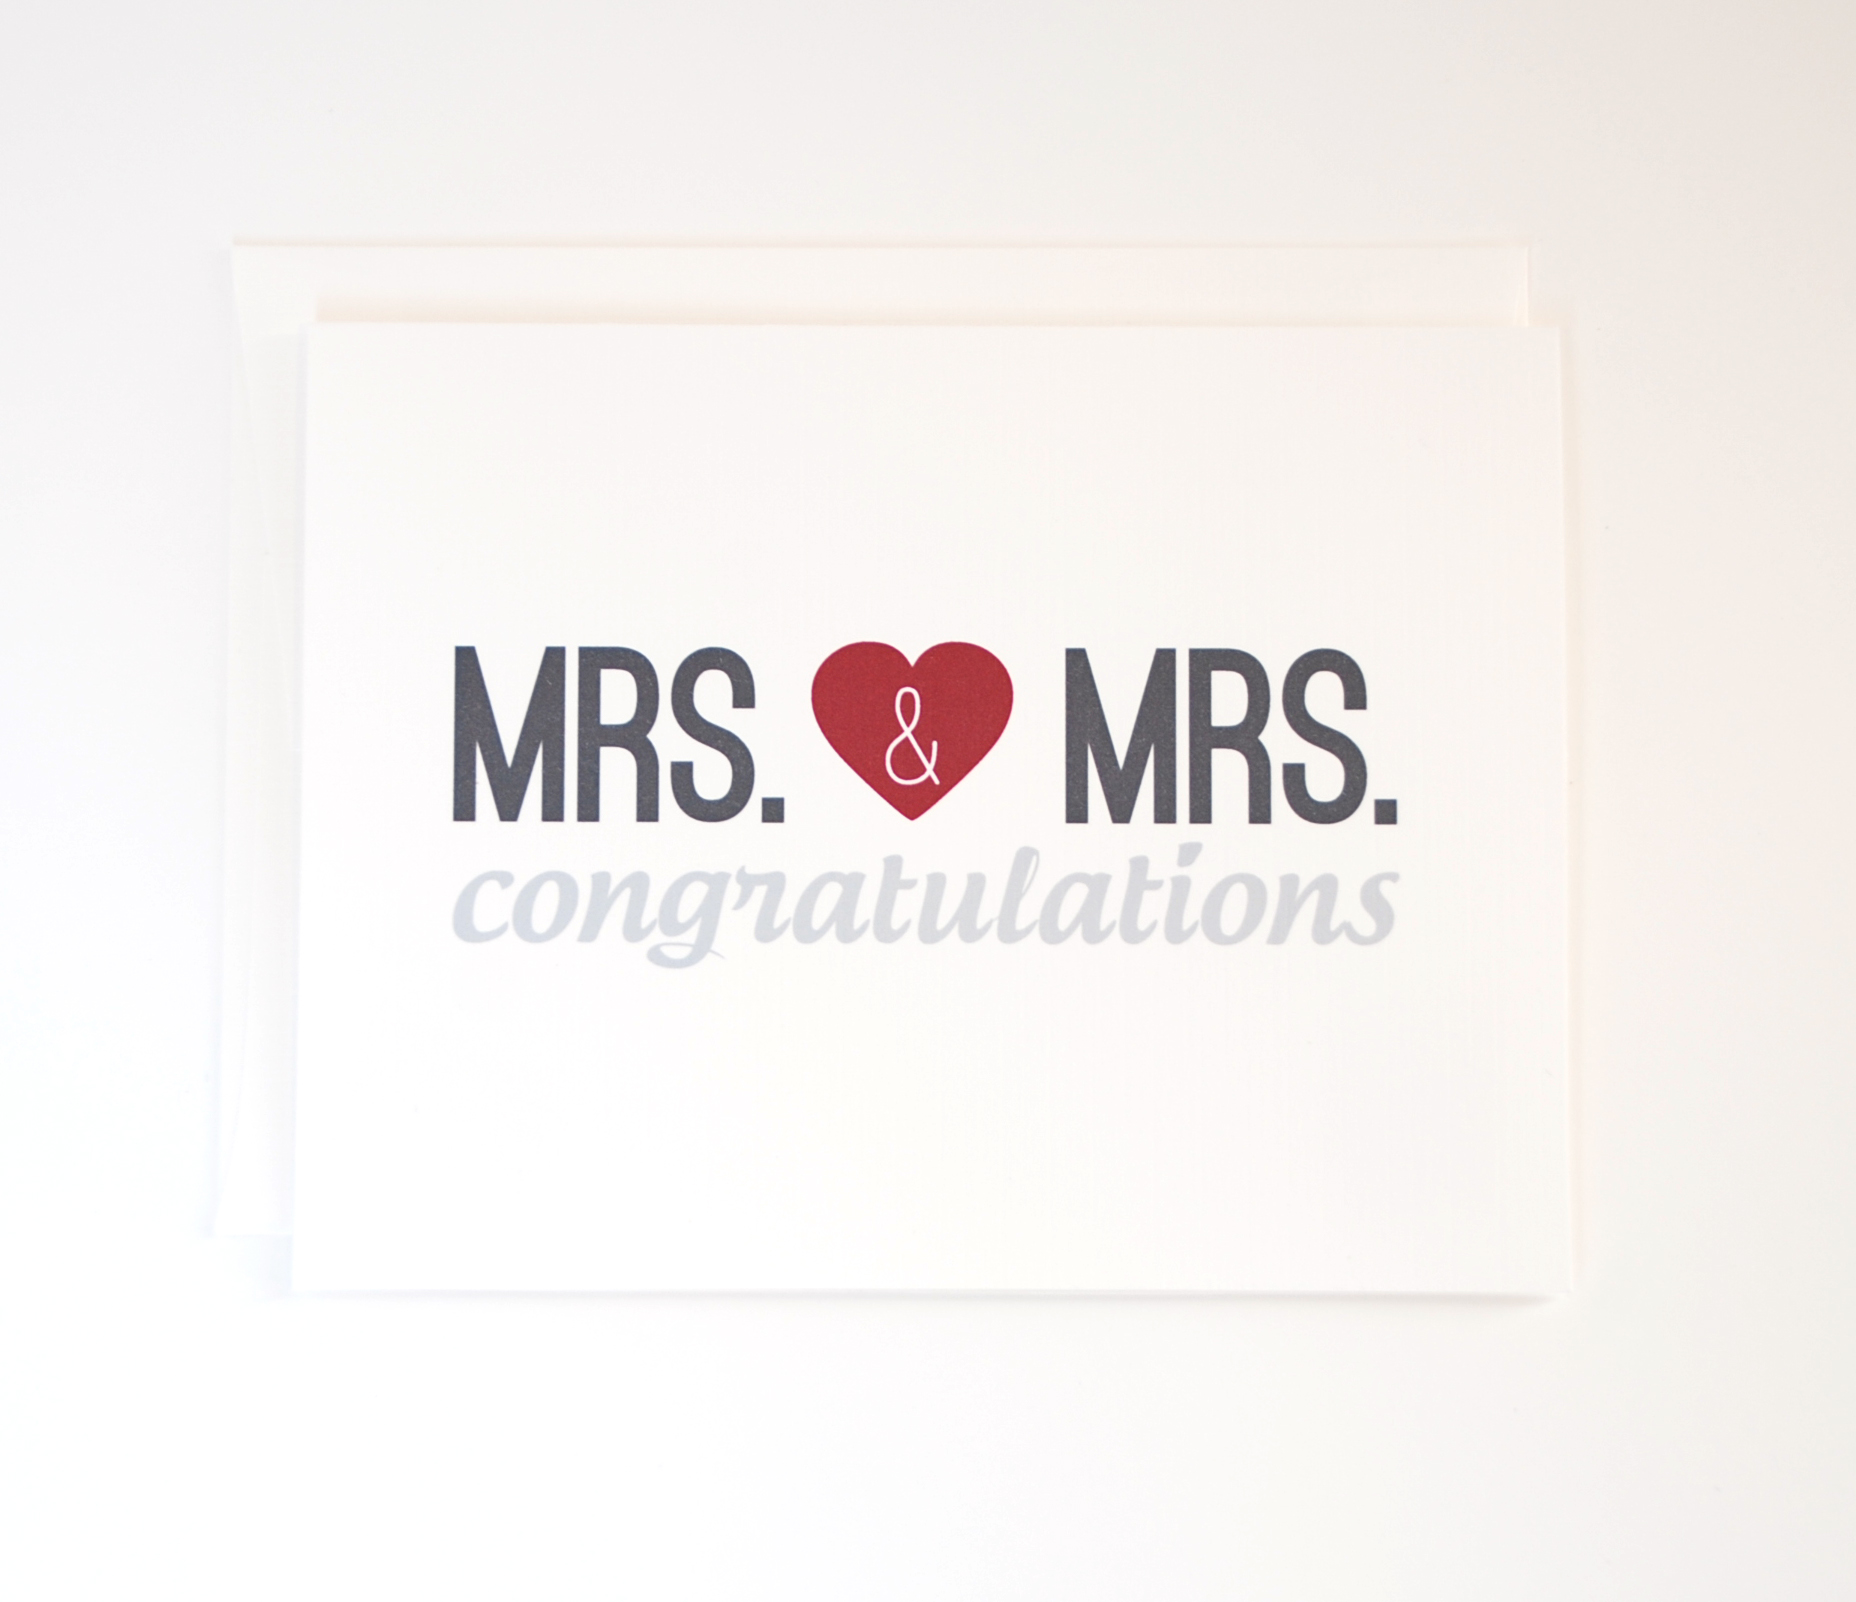 Hallmark Wedding Invitations Online as luxury invitations layout